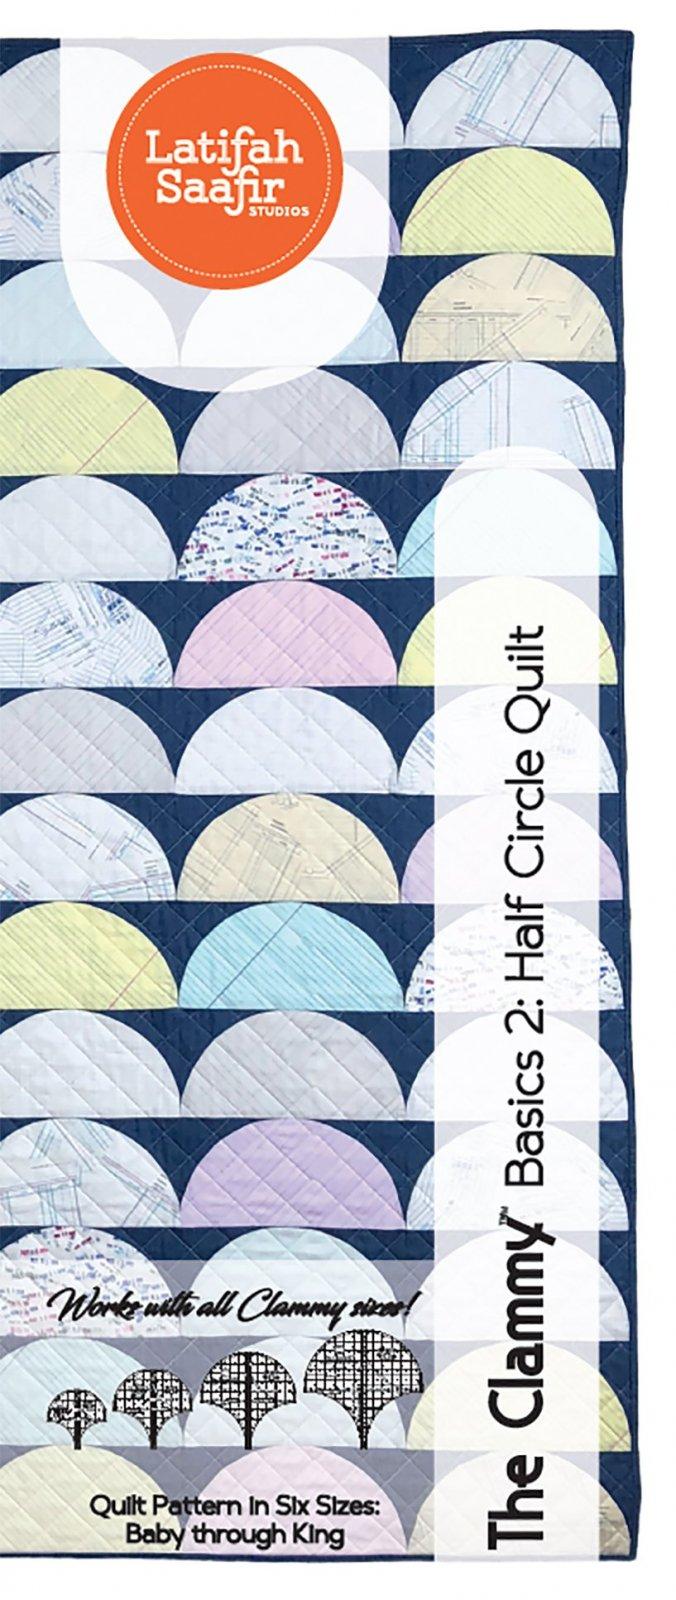 The Clammy Basics 2: Half Circle Quilt Pattern